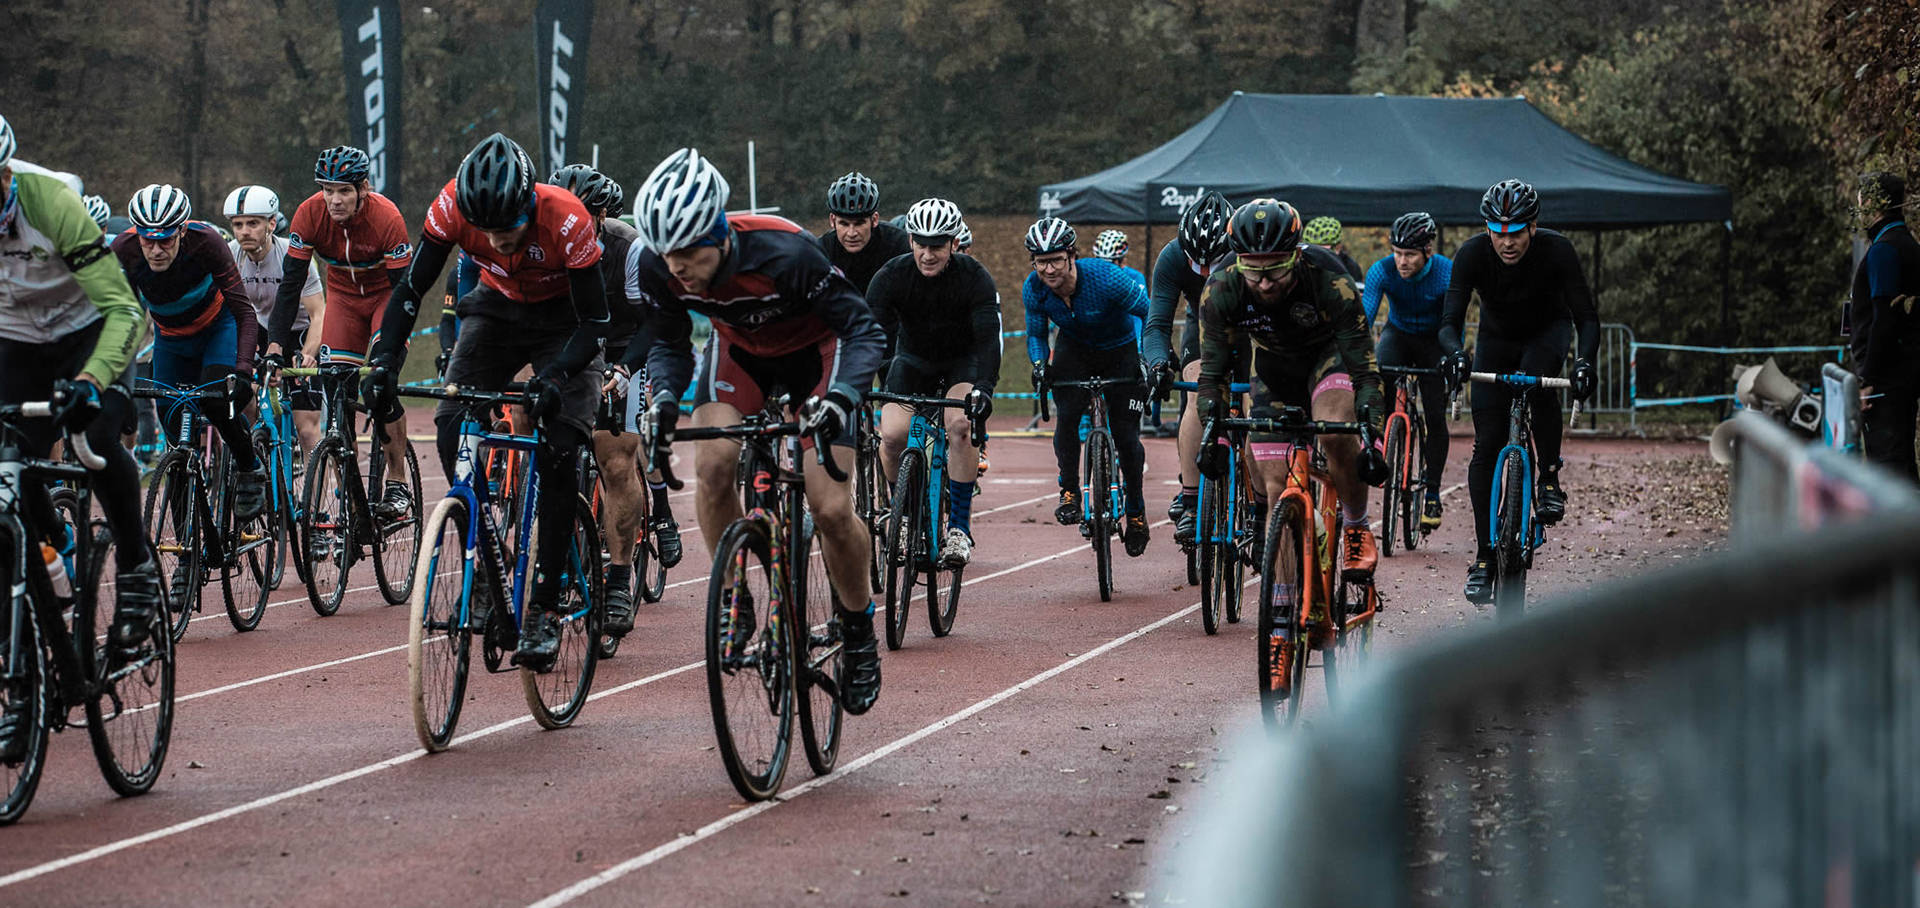 race-cyclocross-bike-street-rain